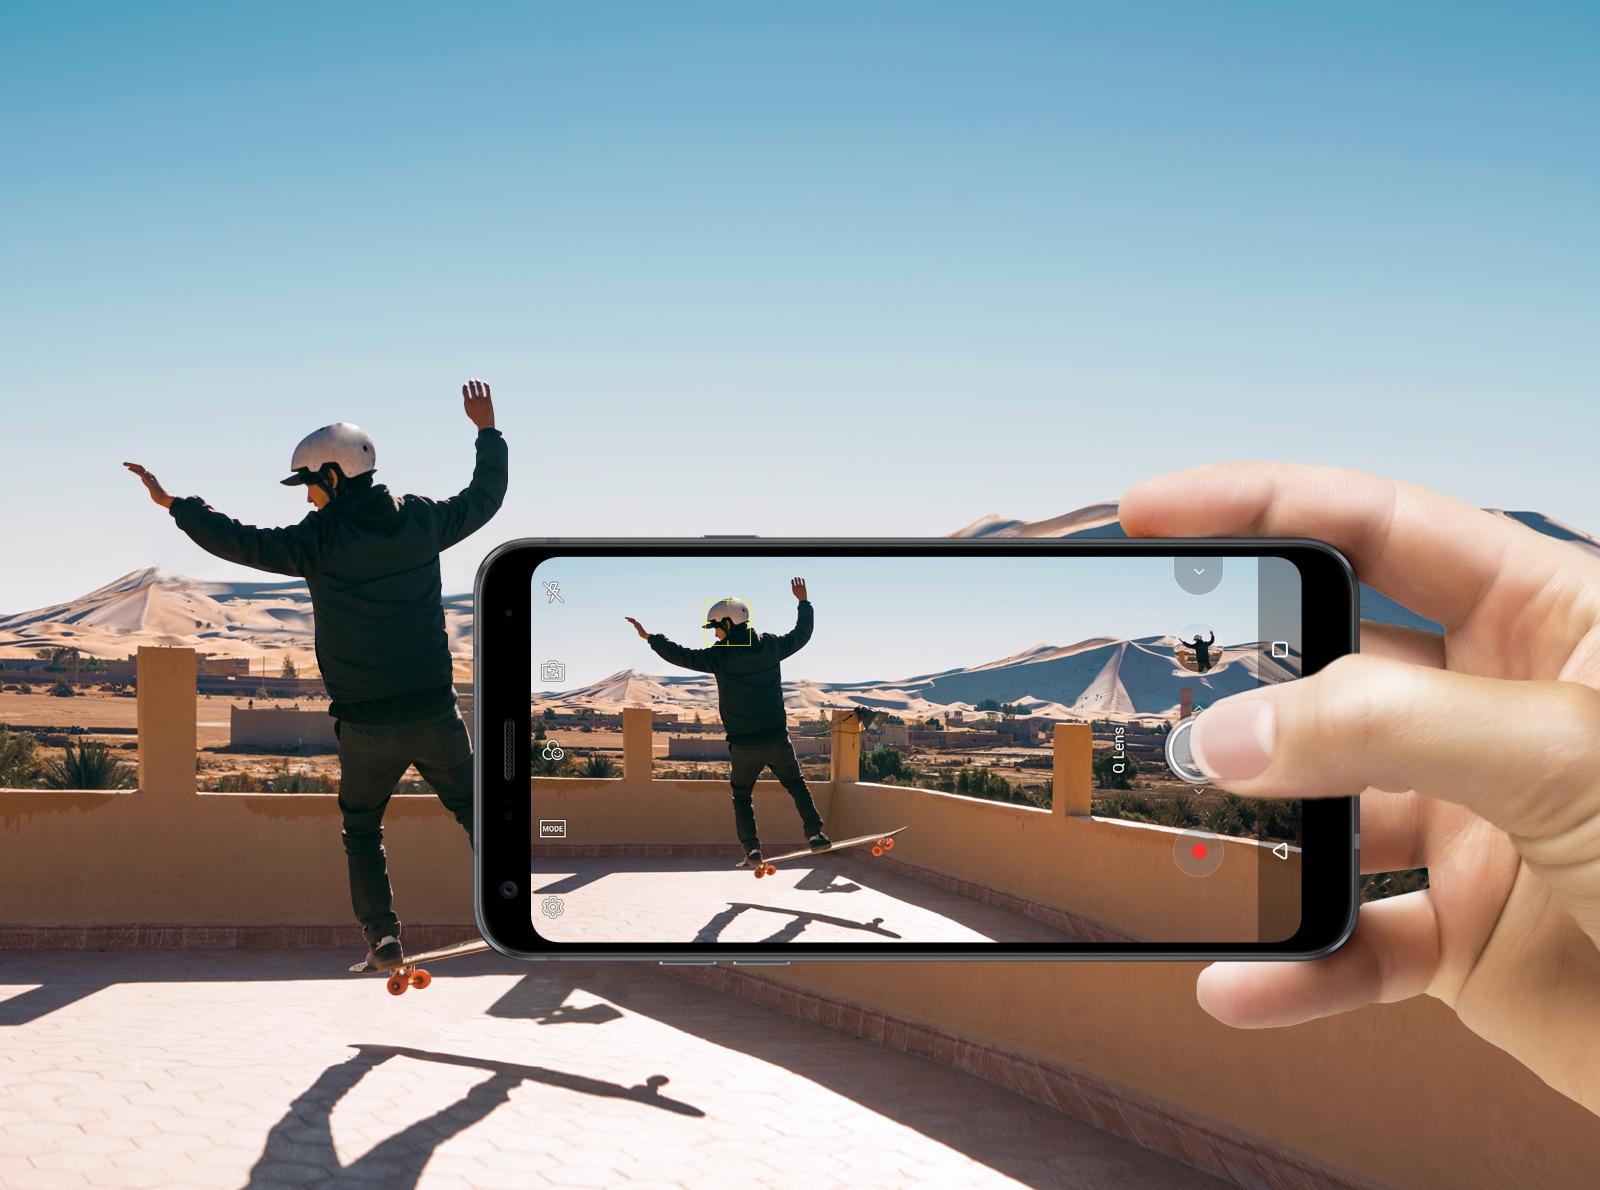 LG Q7 (LMQ610YN) - The AI Powered Smartphone | LG IN